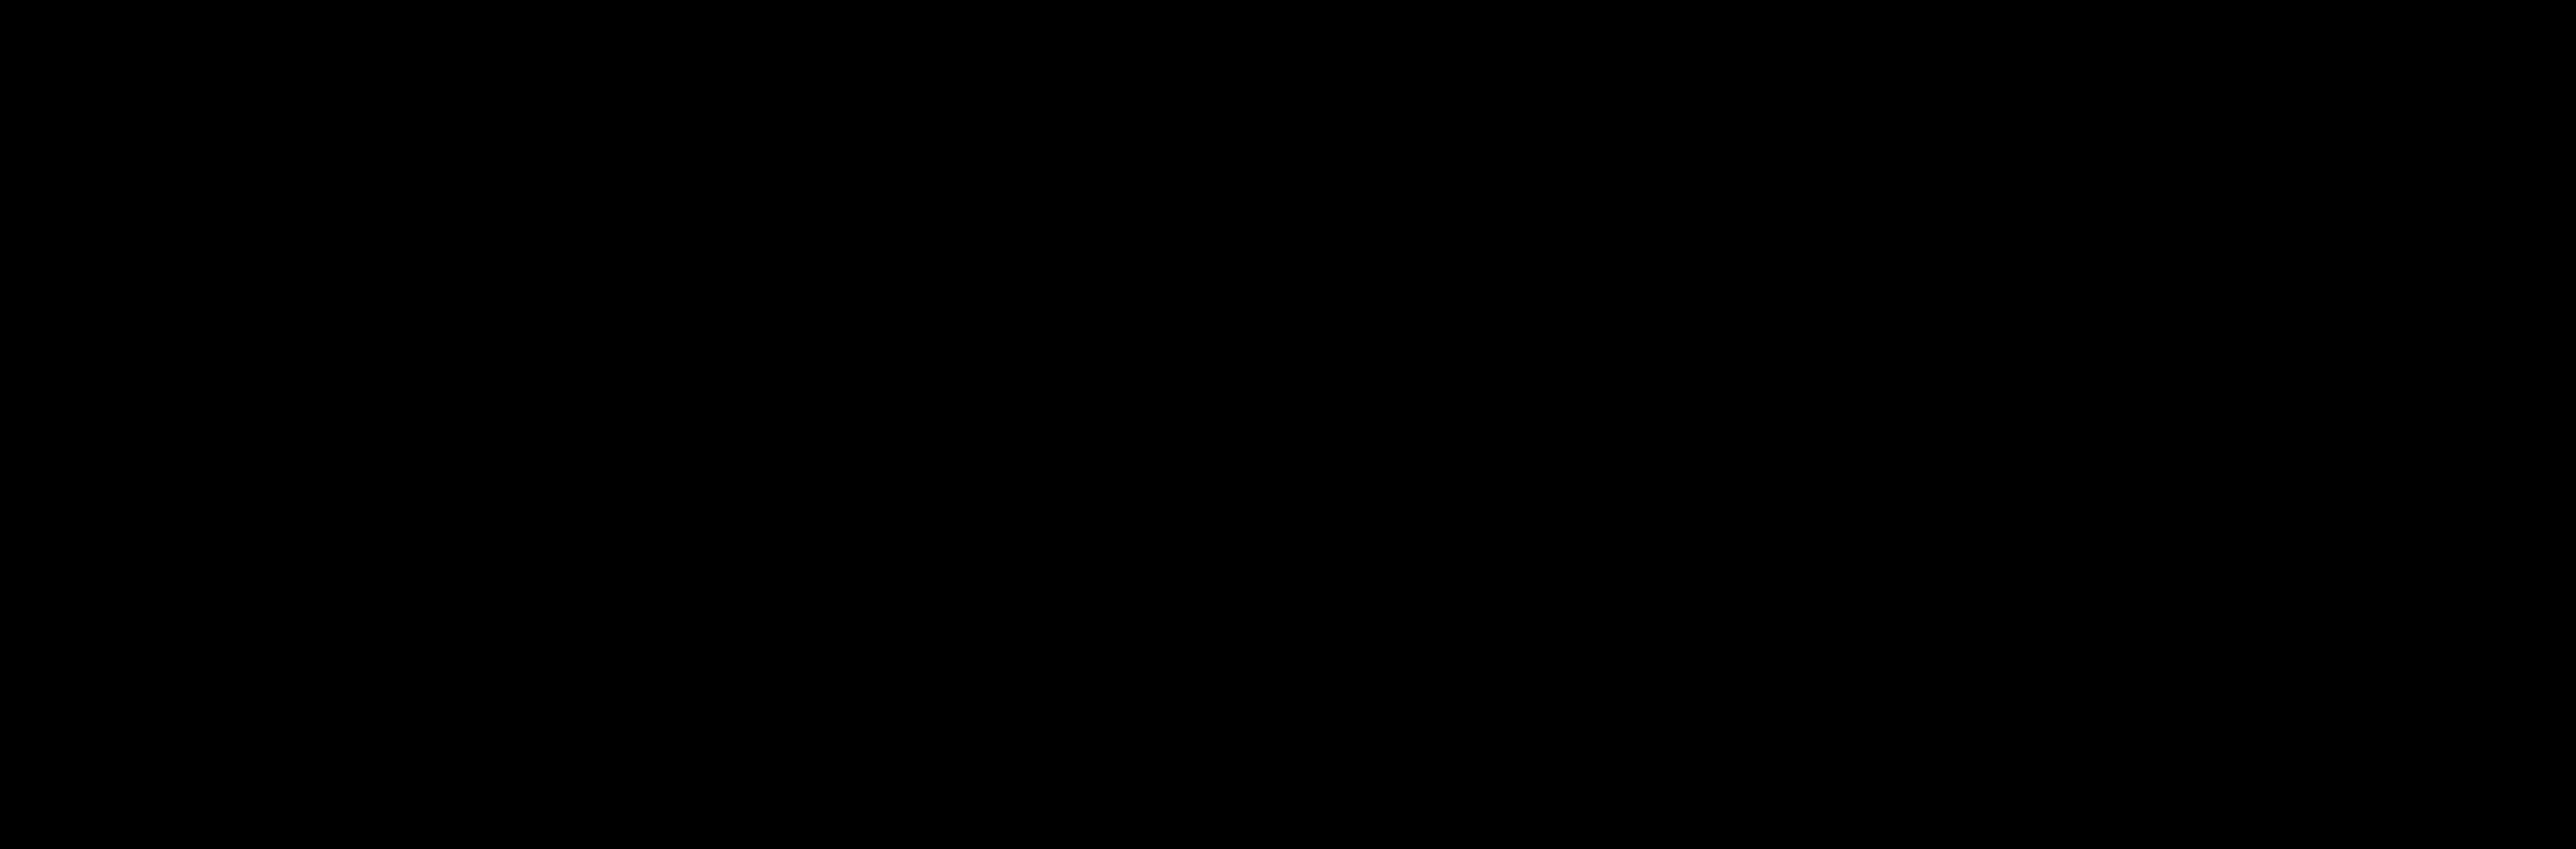 File:Vafaco logo.png